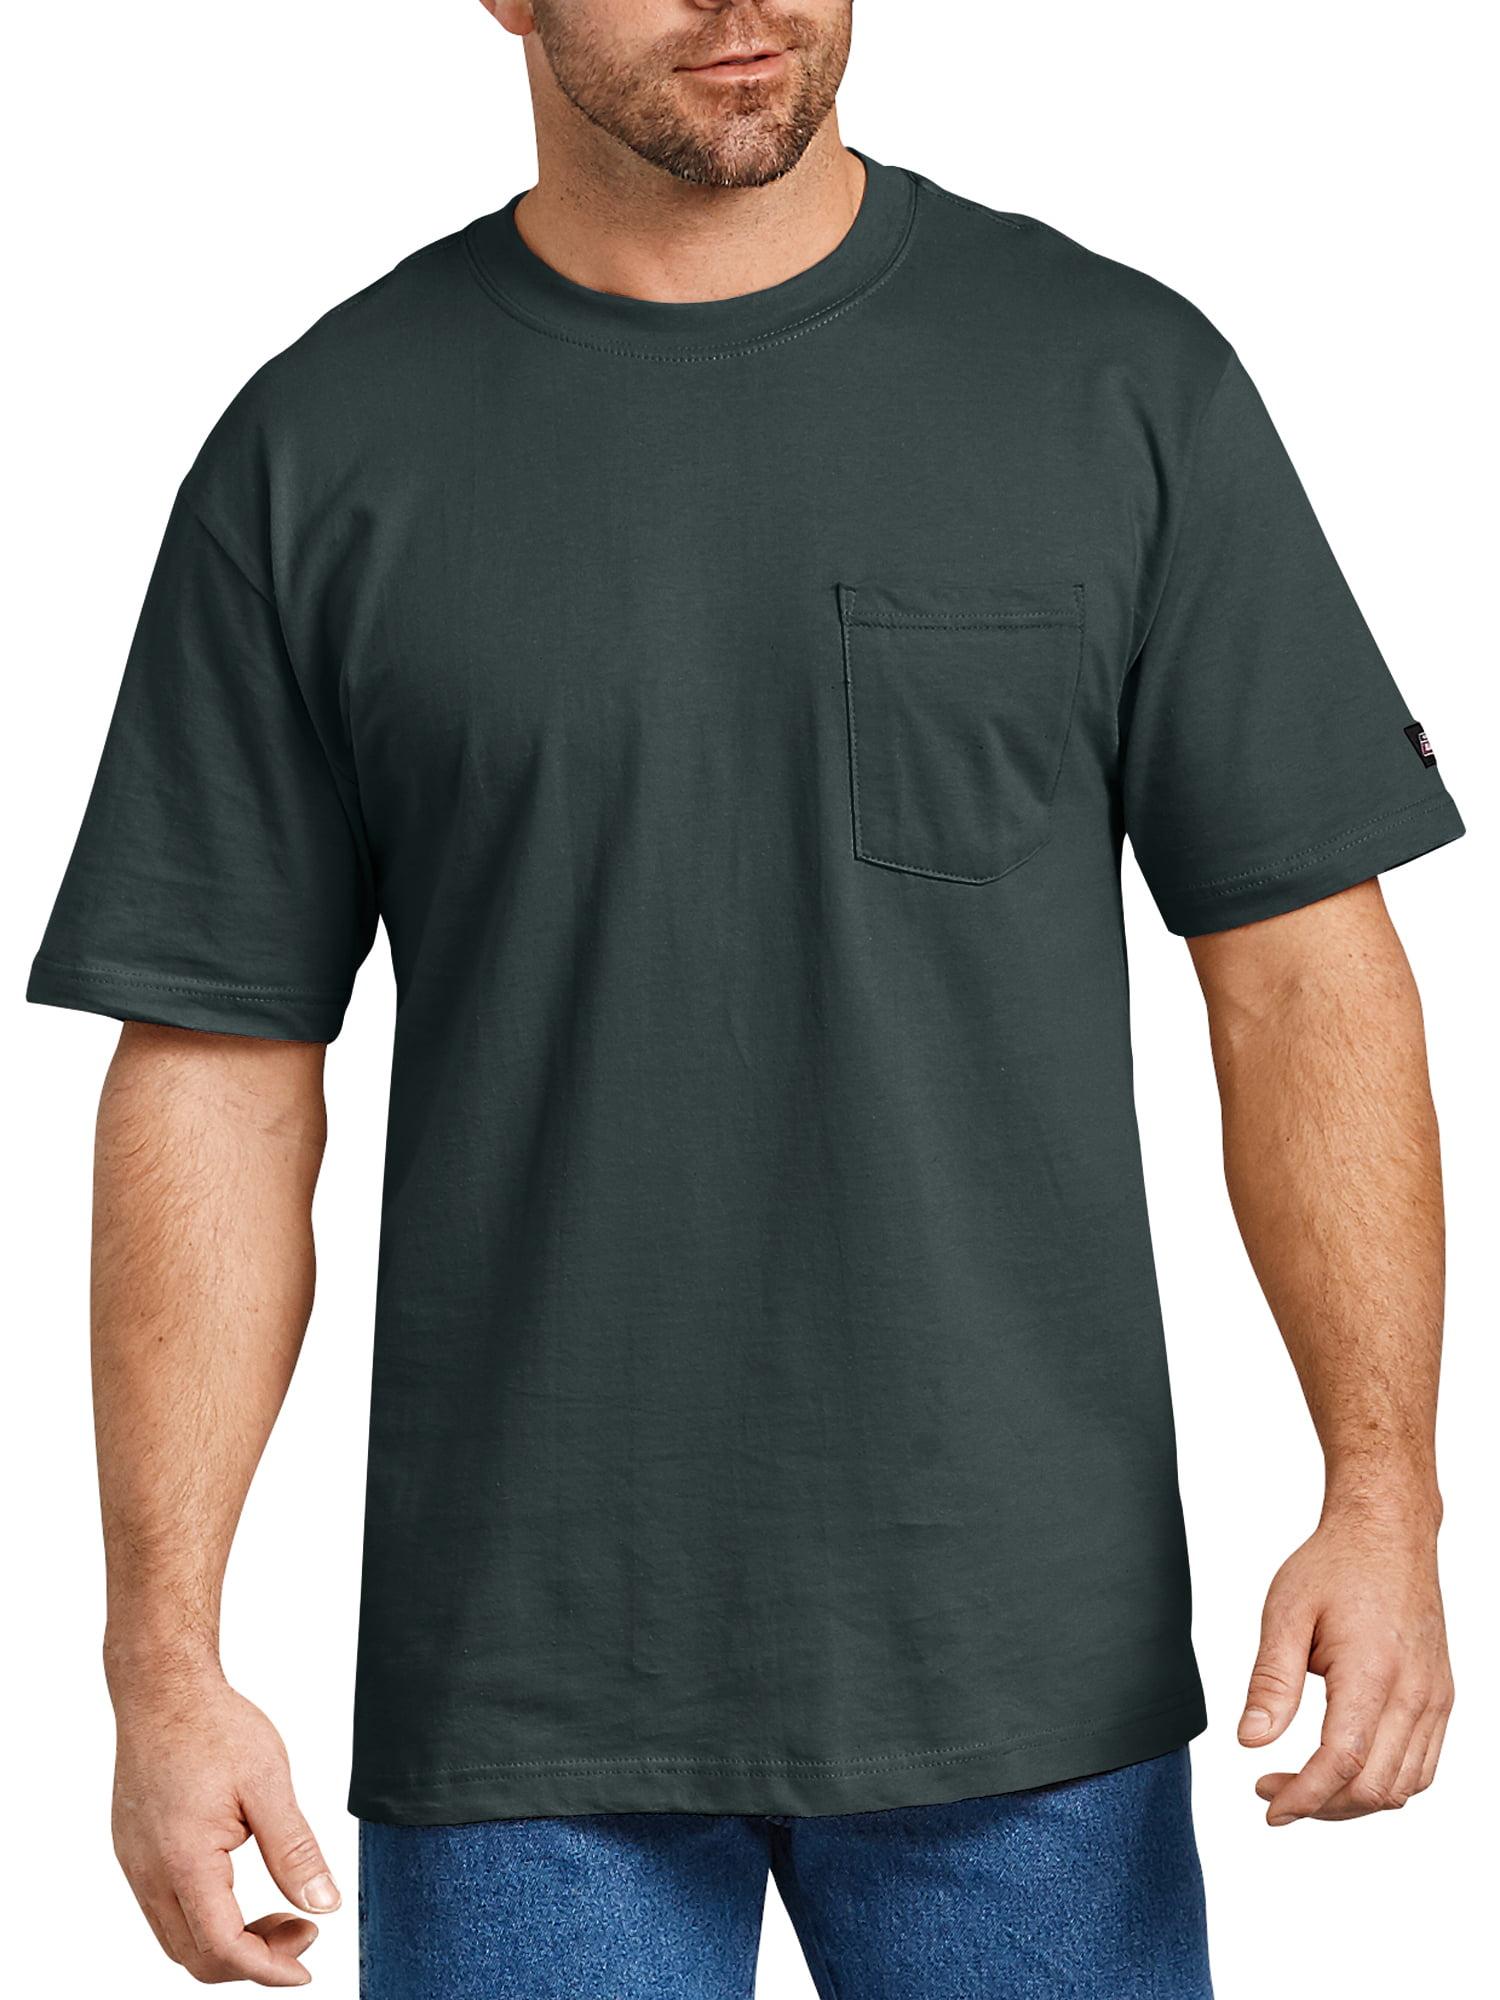 S XL King Apparel Origin Short Sleeve Sweatshirt 2XL 3XL M Black 4XL L